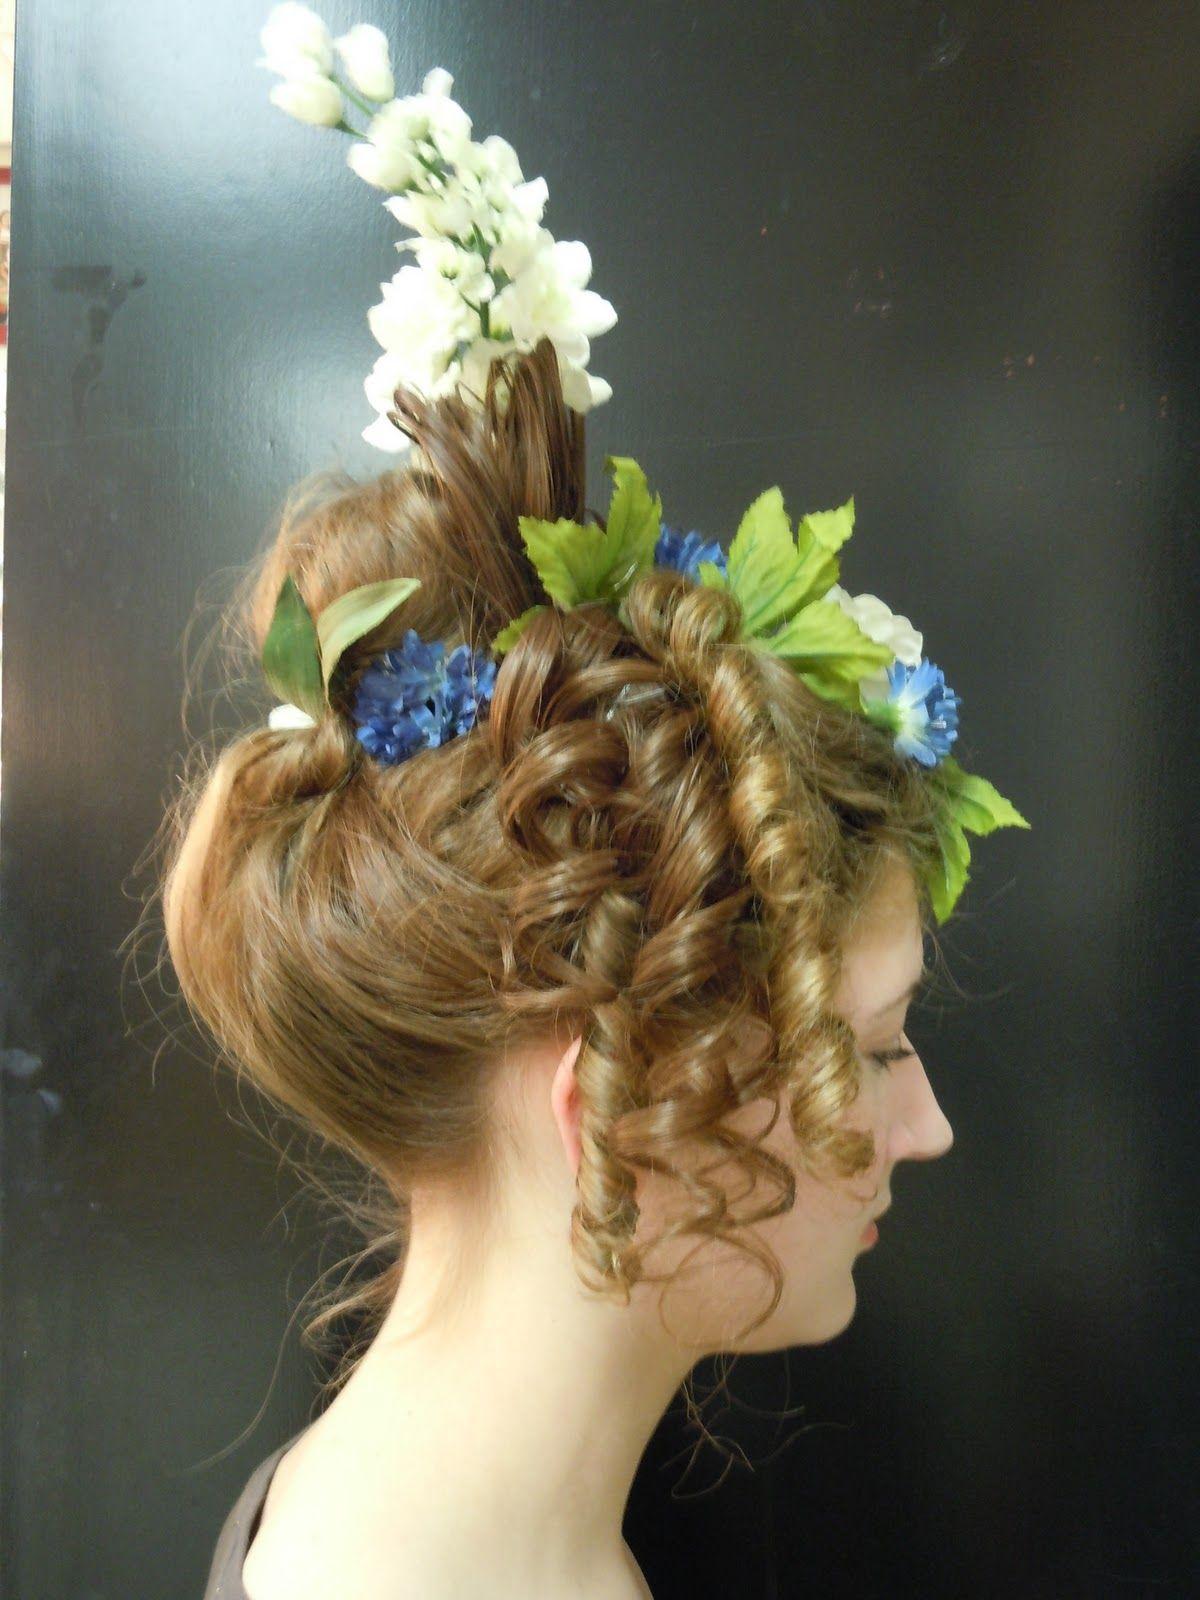 1830s hairstyles - google